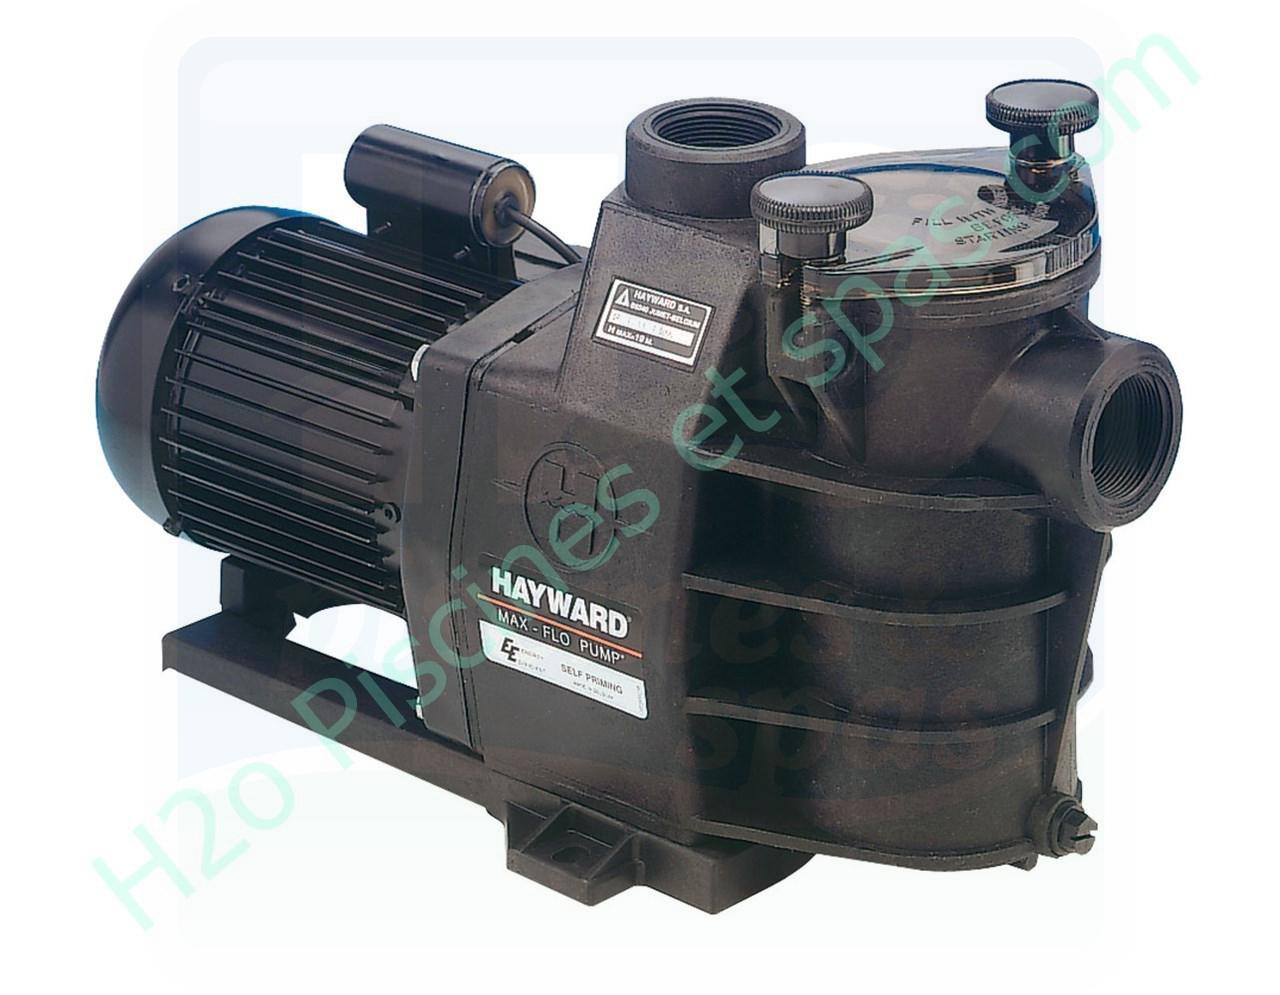 Pompe de filtration hayward max flo 1 5 cv 15m3 h for Pompe piscine 15m3 h